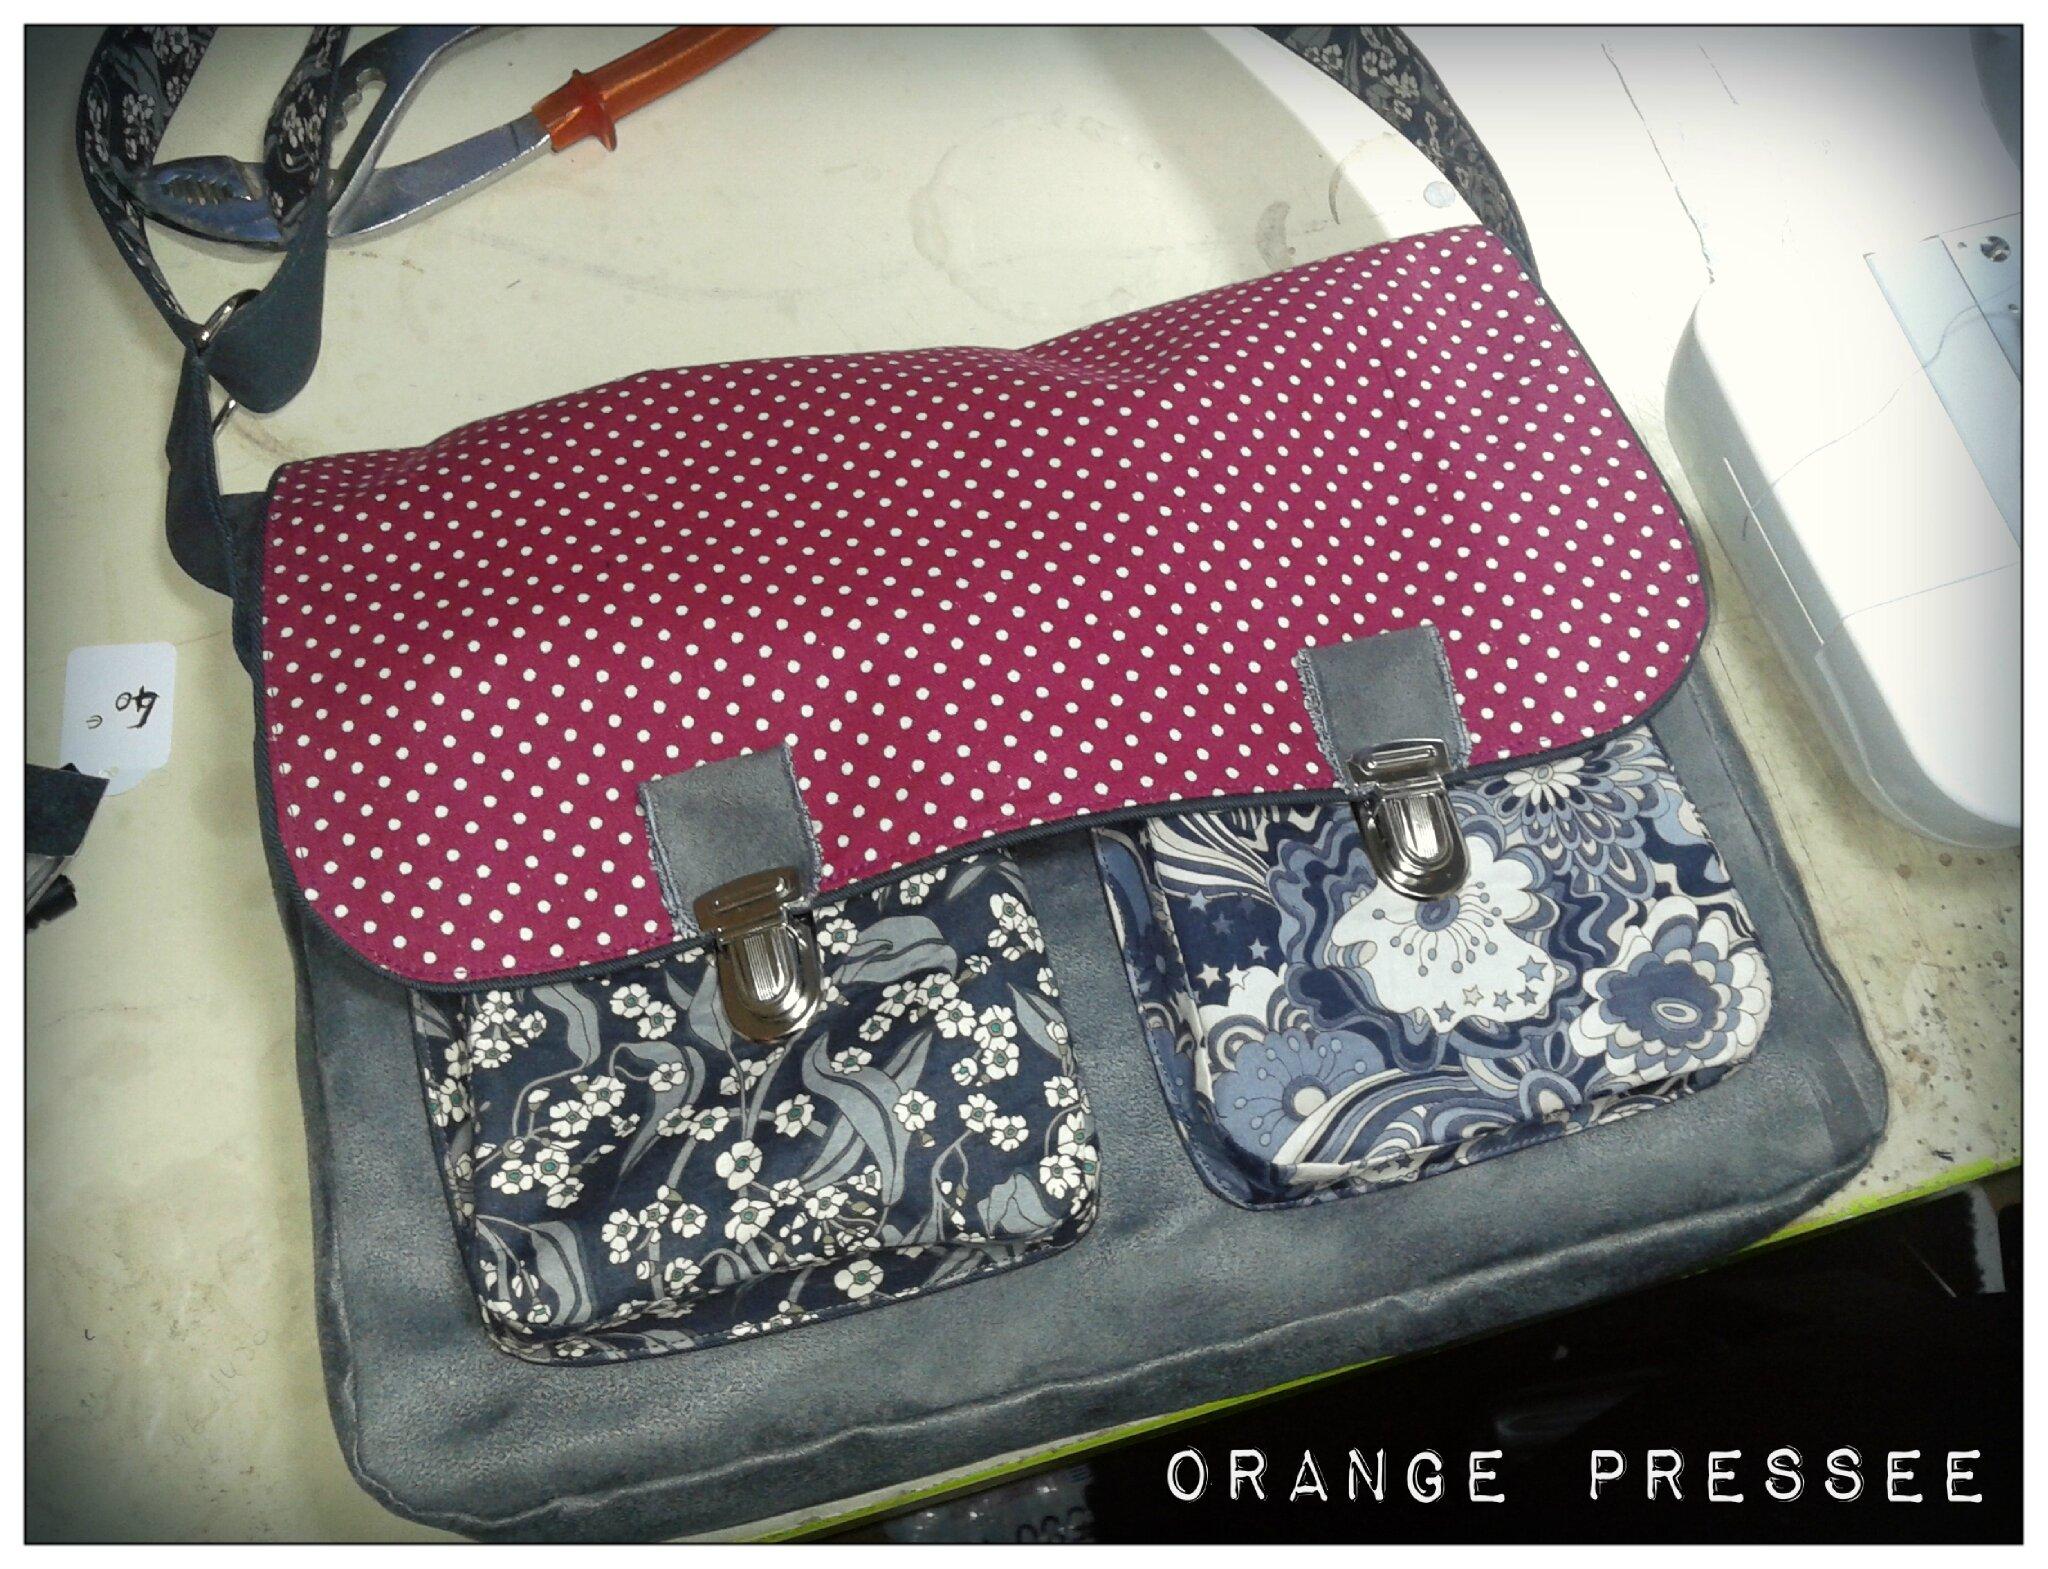 bags orange press e. Black Bedroom Furniture Sets. Home Design Ideas